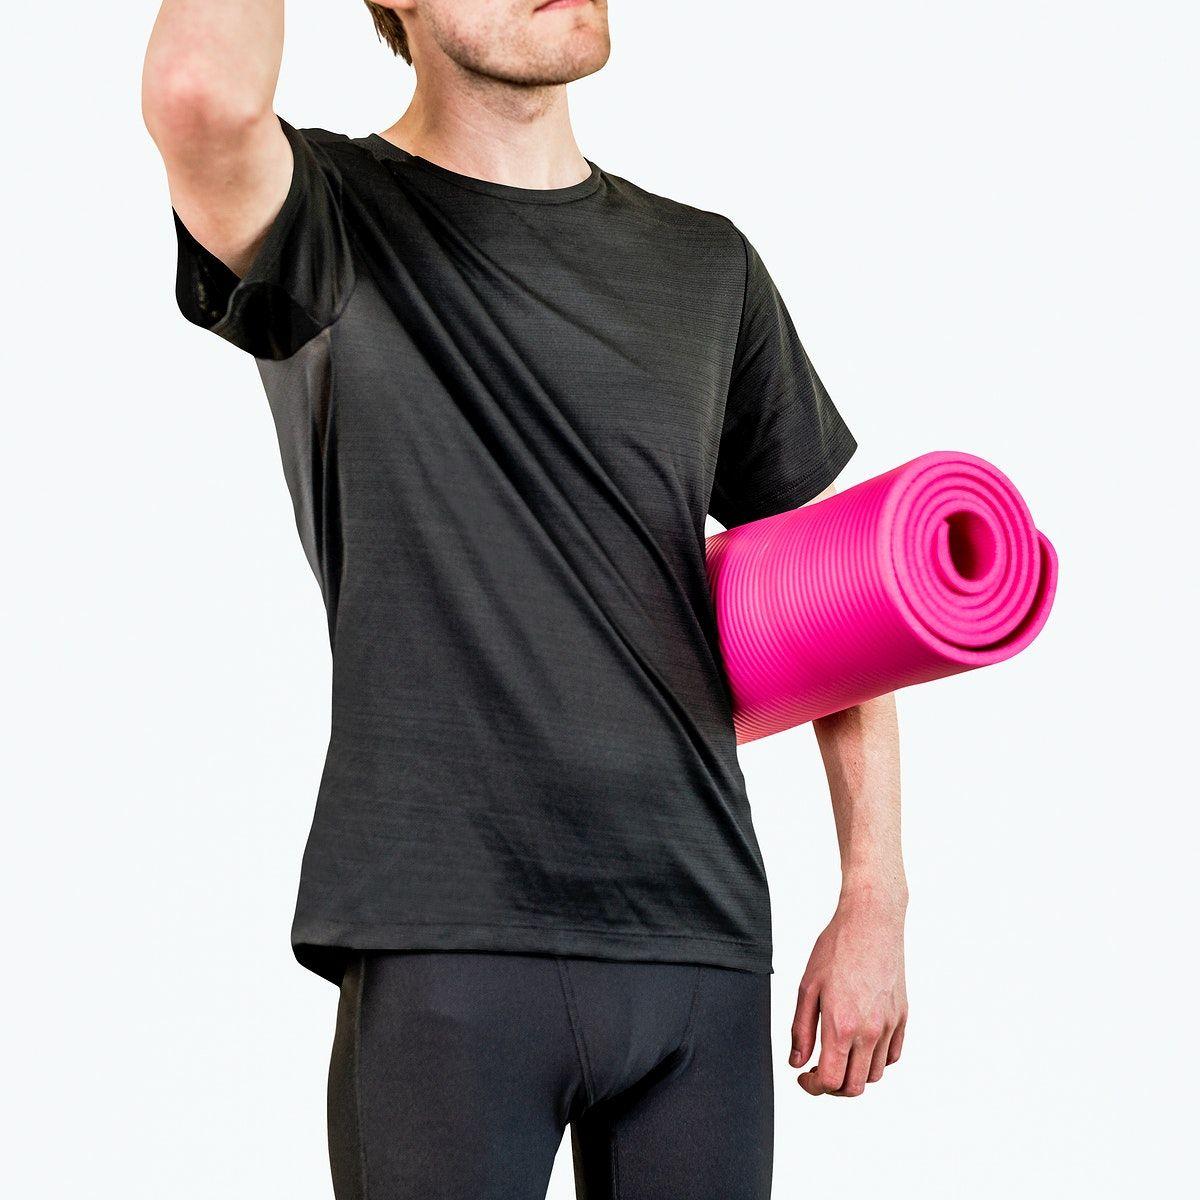 Download Download Premium Psd Of Men S Sportswear And Yoga Mat Mockup Psd Clothing Mockup Mens Sportswear Sportswear